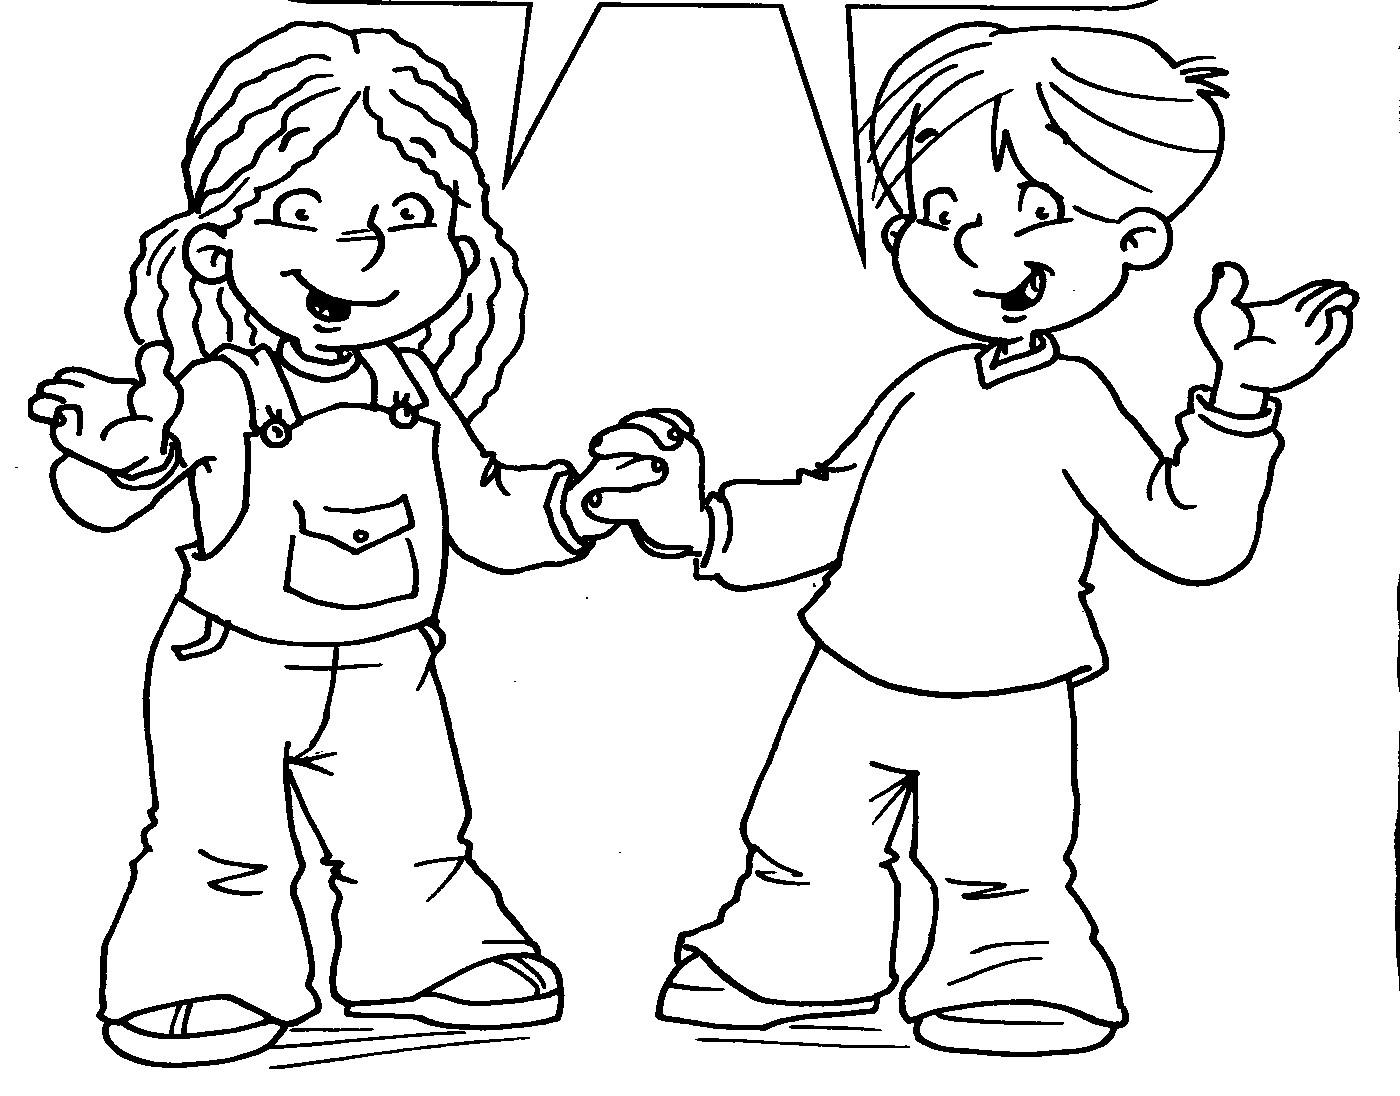 Dibujos Infantiles Escolares Para Colorear: Dibujos De Convivencia Escolar Para Colorear